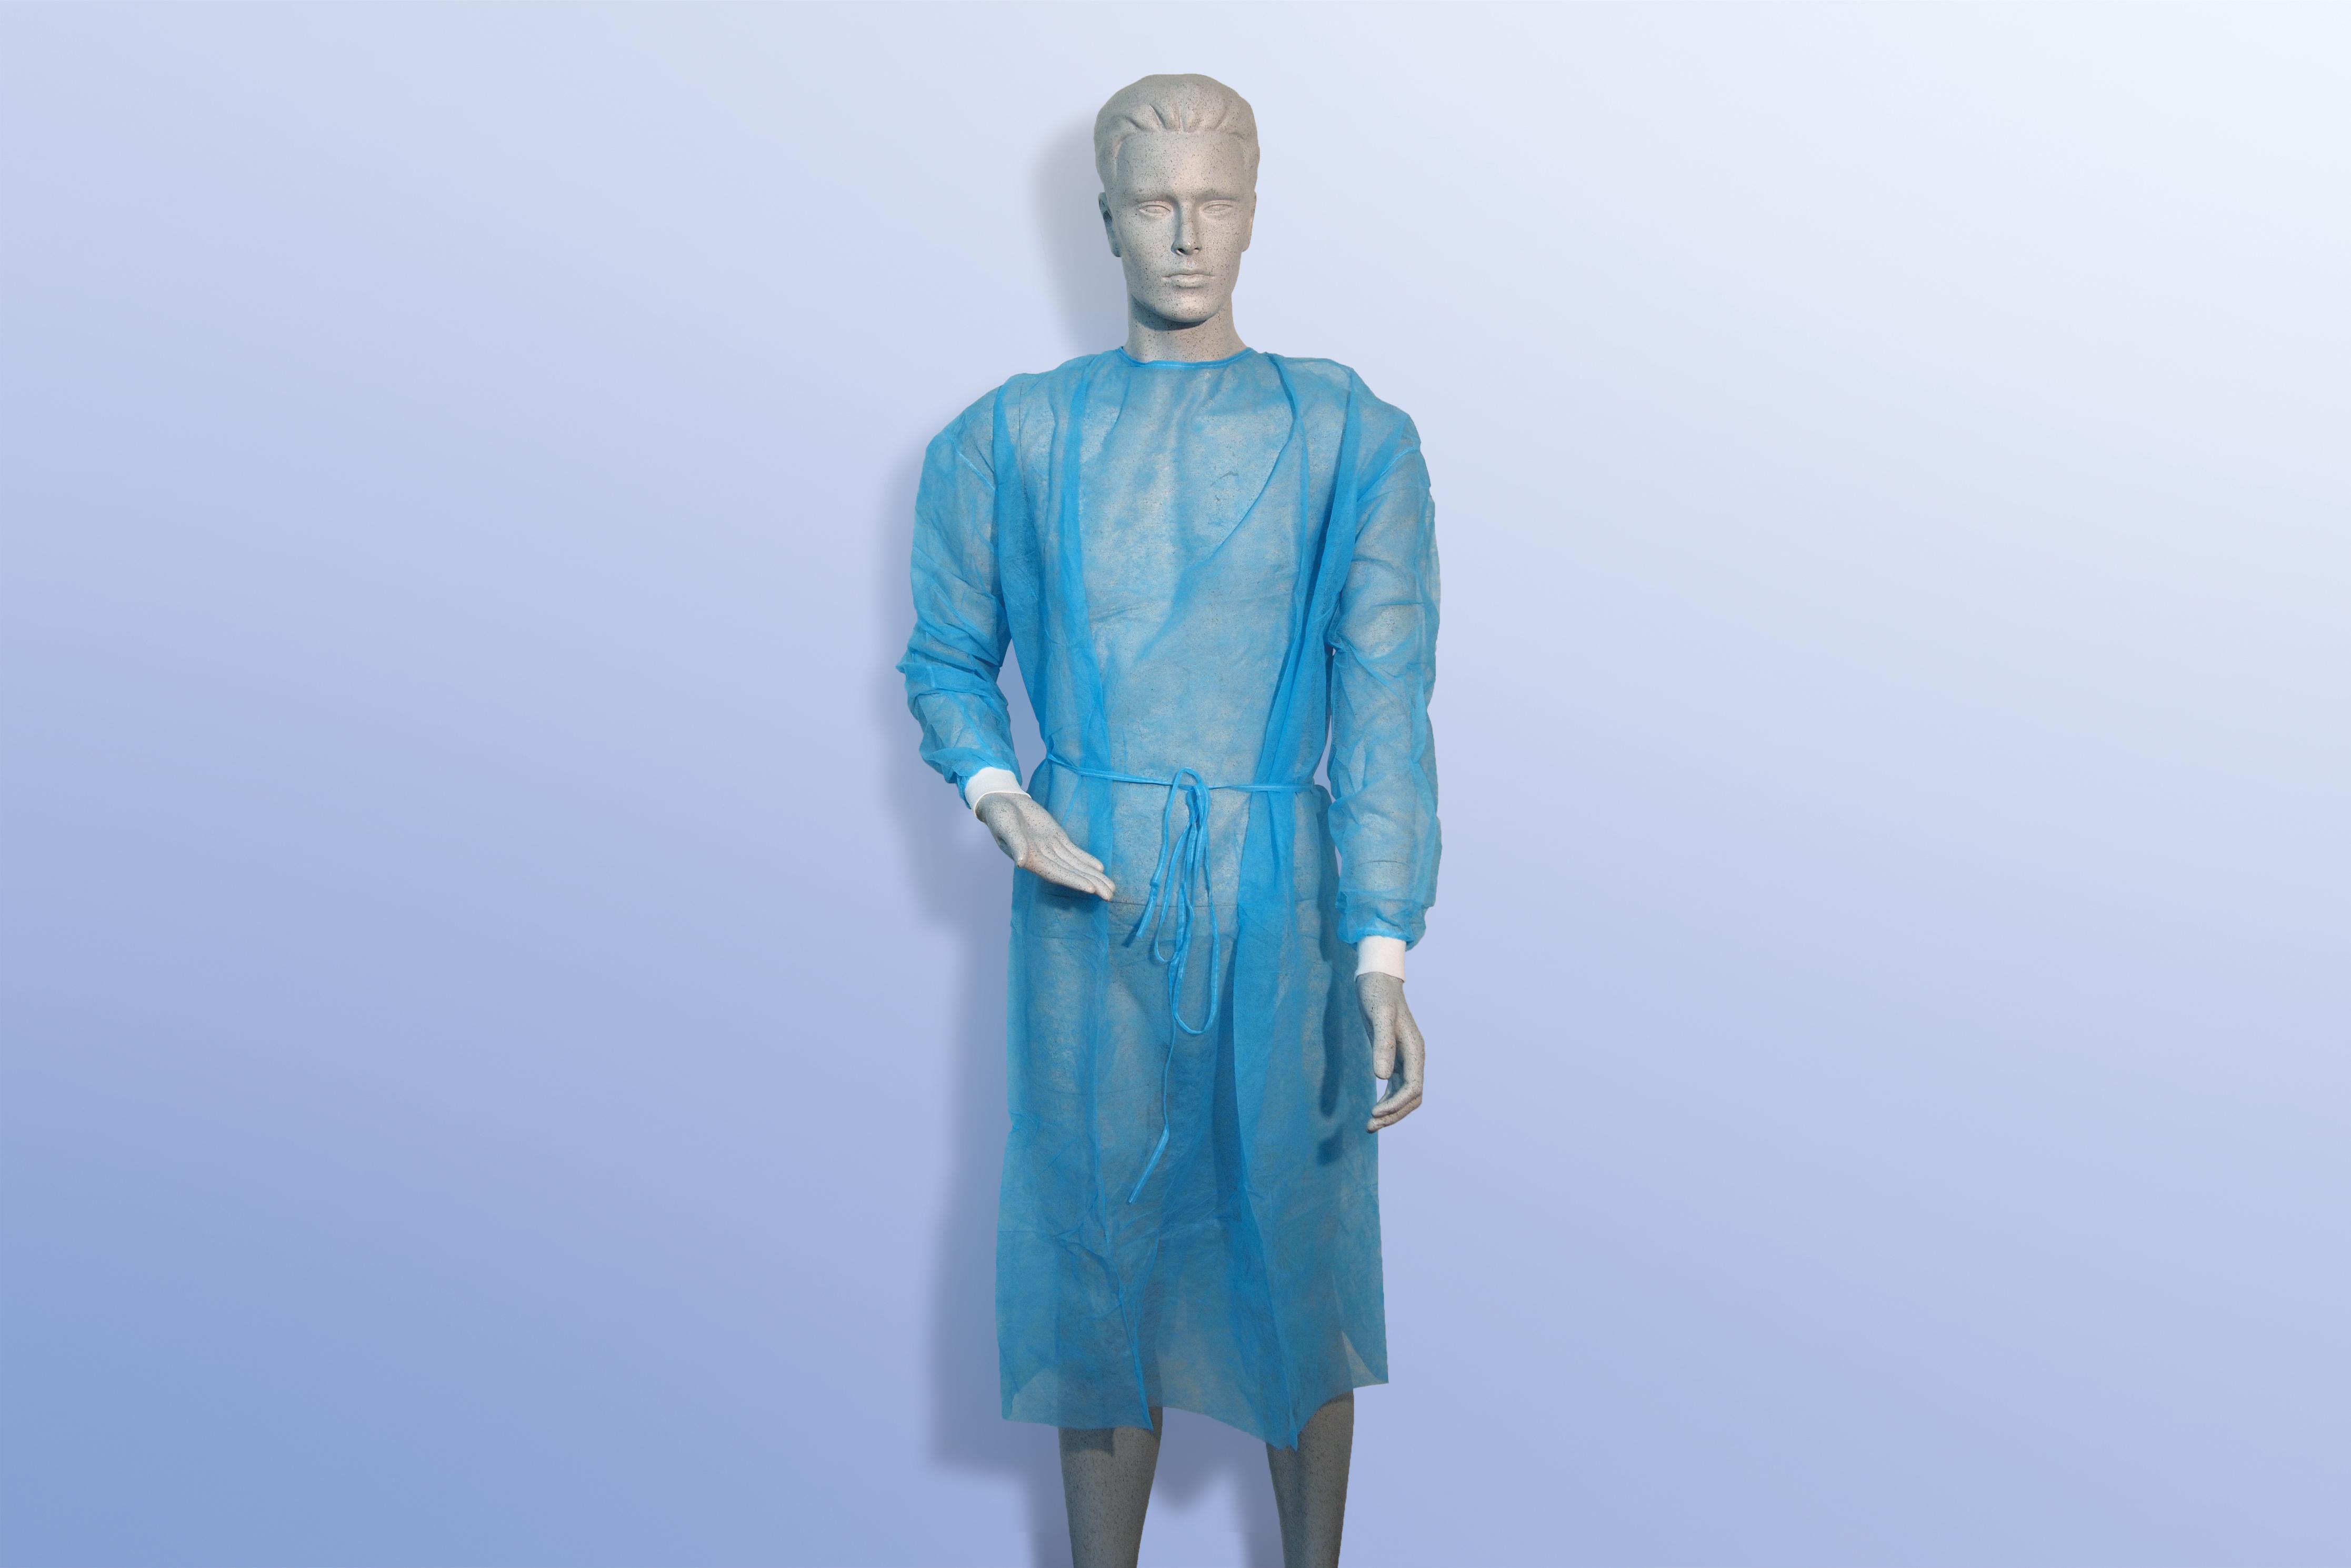 Besucherkittel blau 120 cm lang 144 cm breit, Packung â 100 Stück